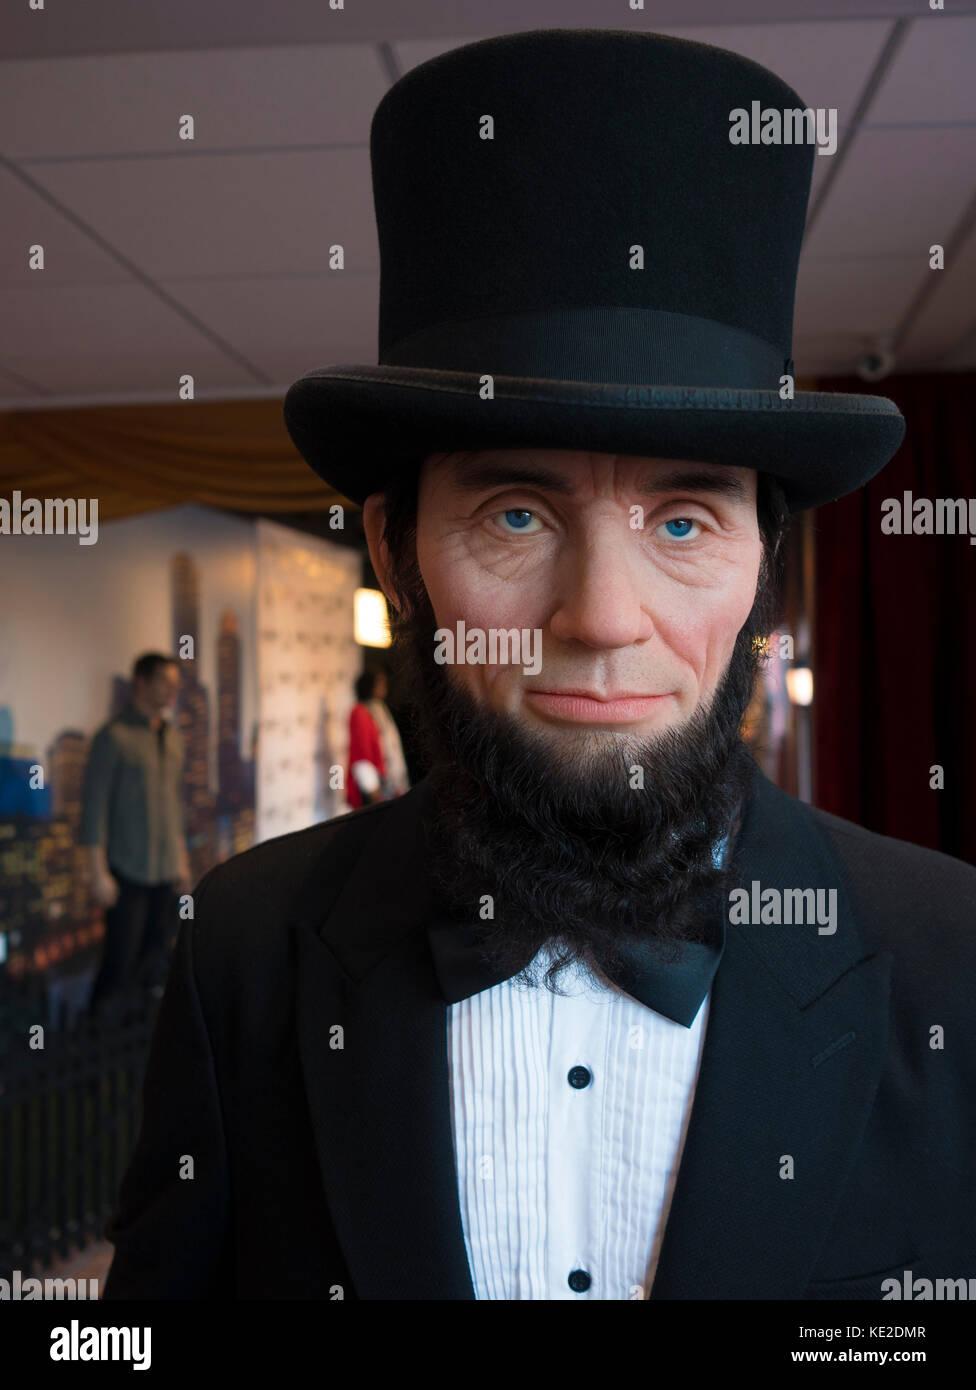 Abraham Lincoln - Stock Image